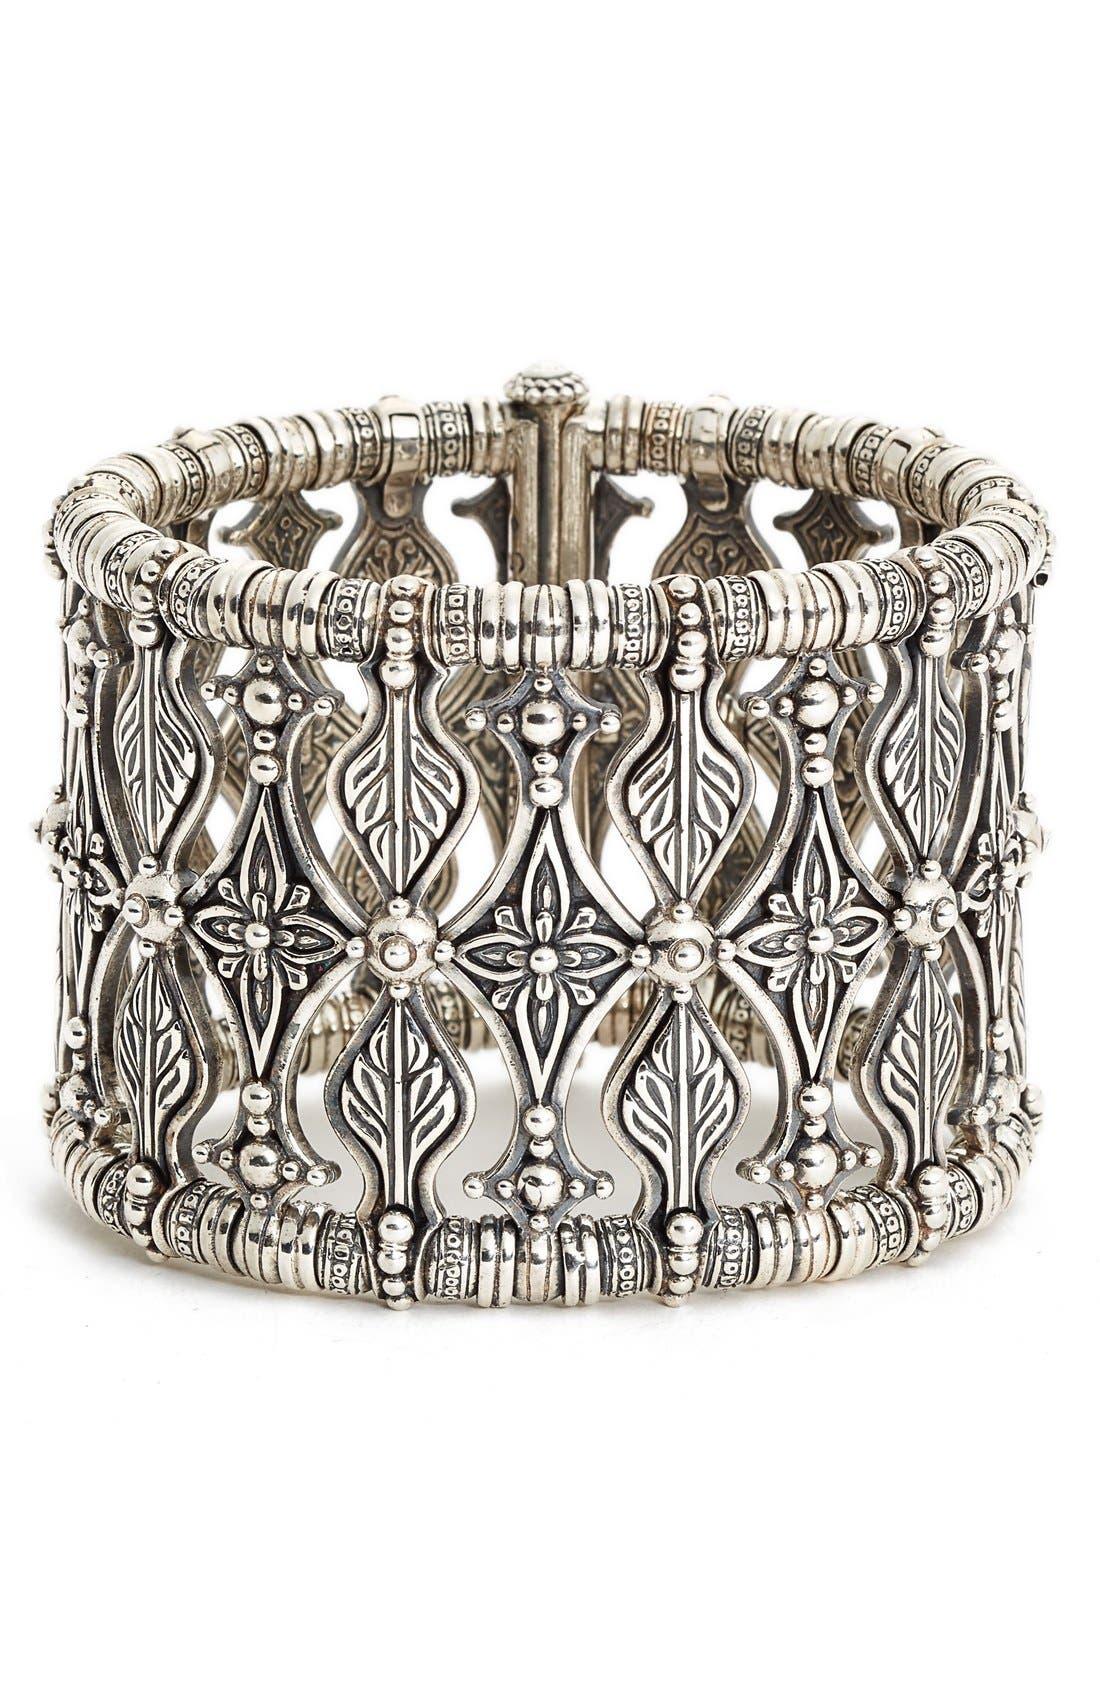 KONSTANTINO 'Penelope' Floral Metalwork Bracelet